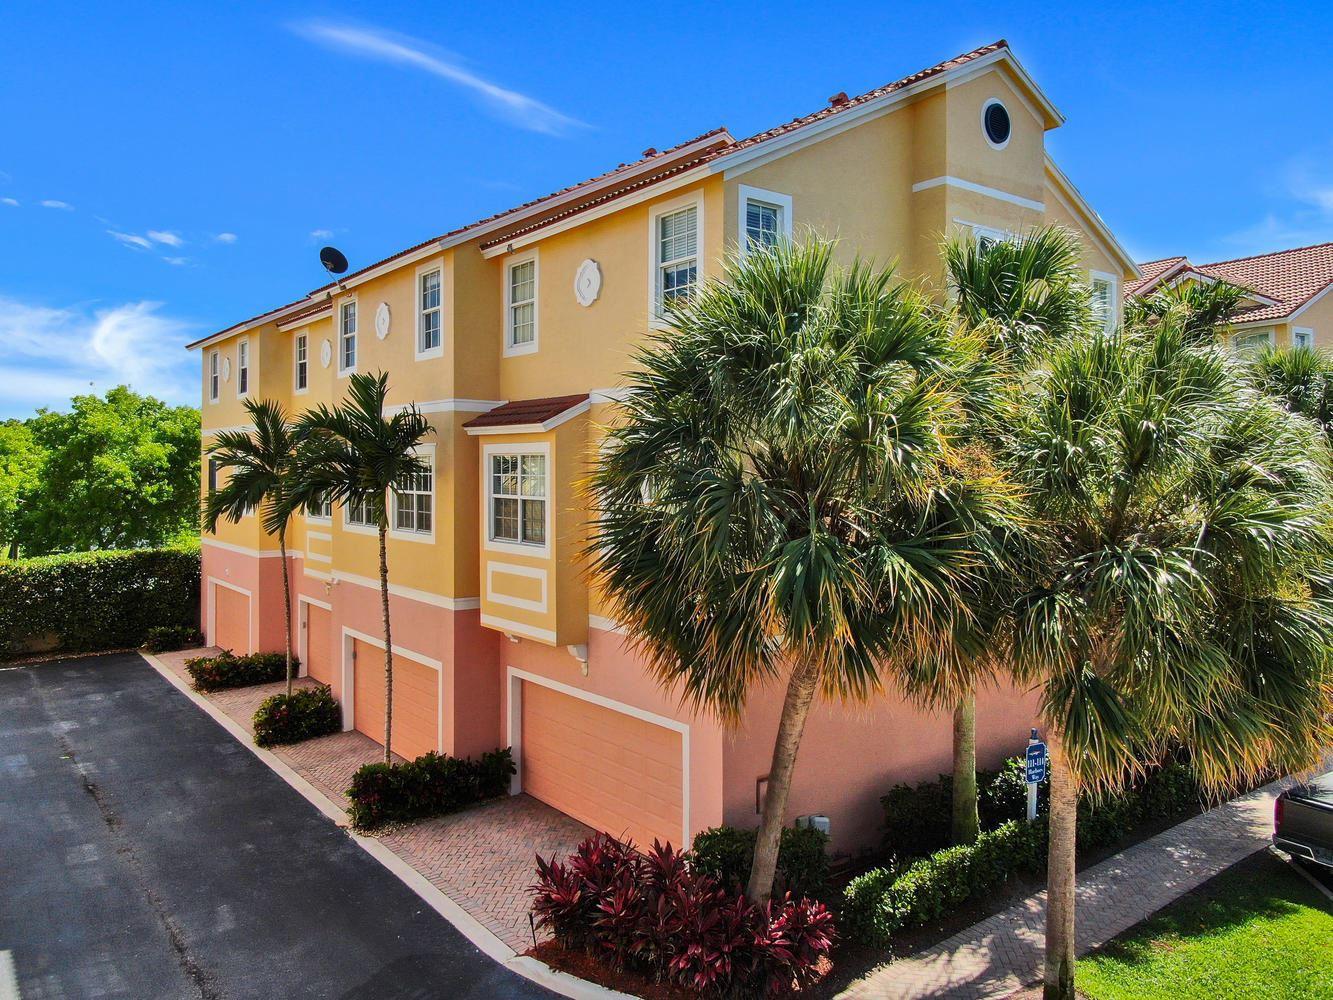 112 Harbors Way, Boynton Beach, FL 33435 - #: RX-10622054